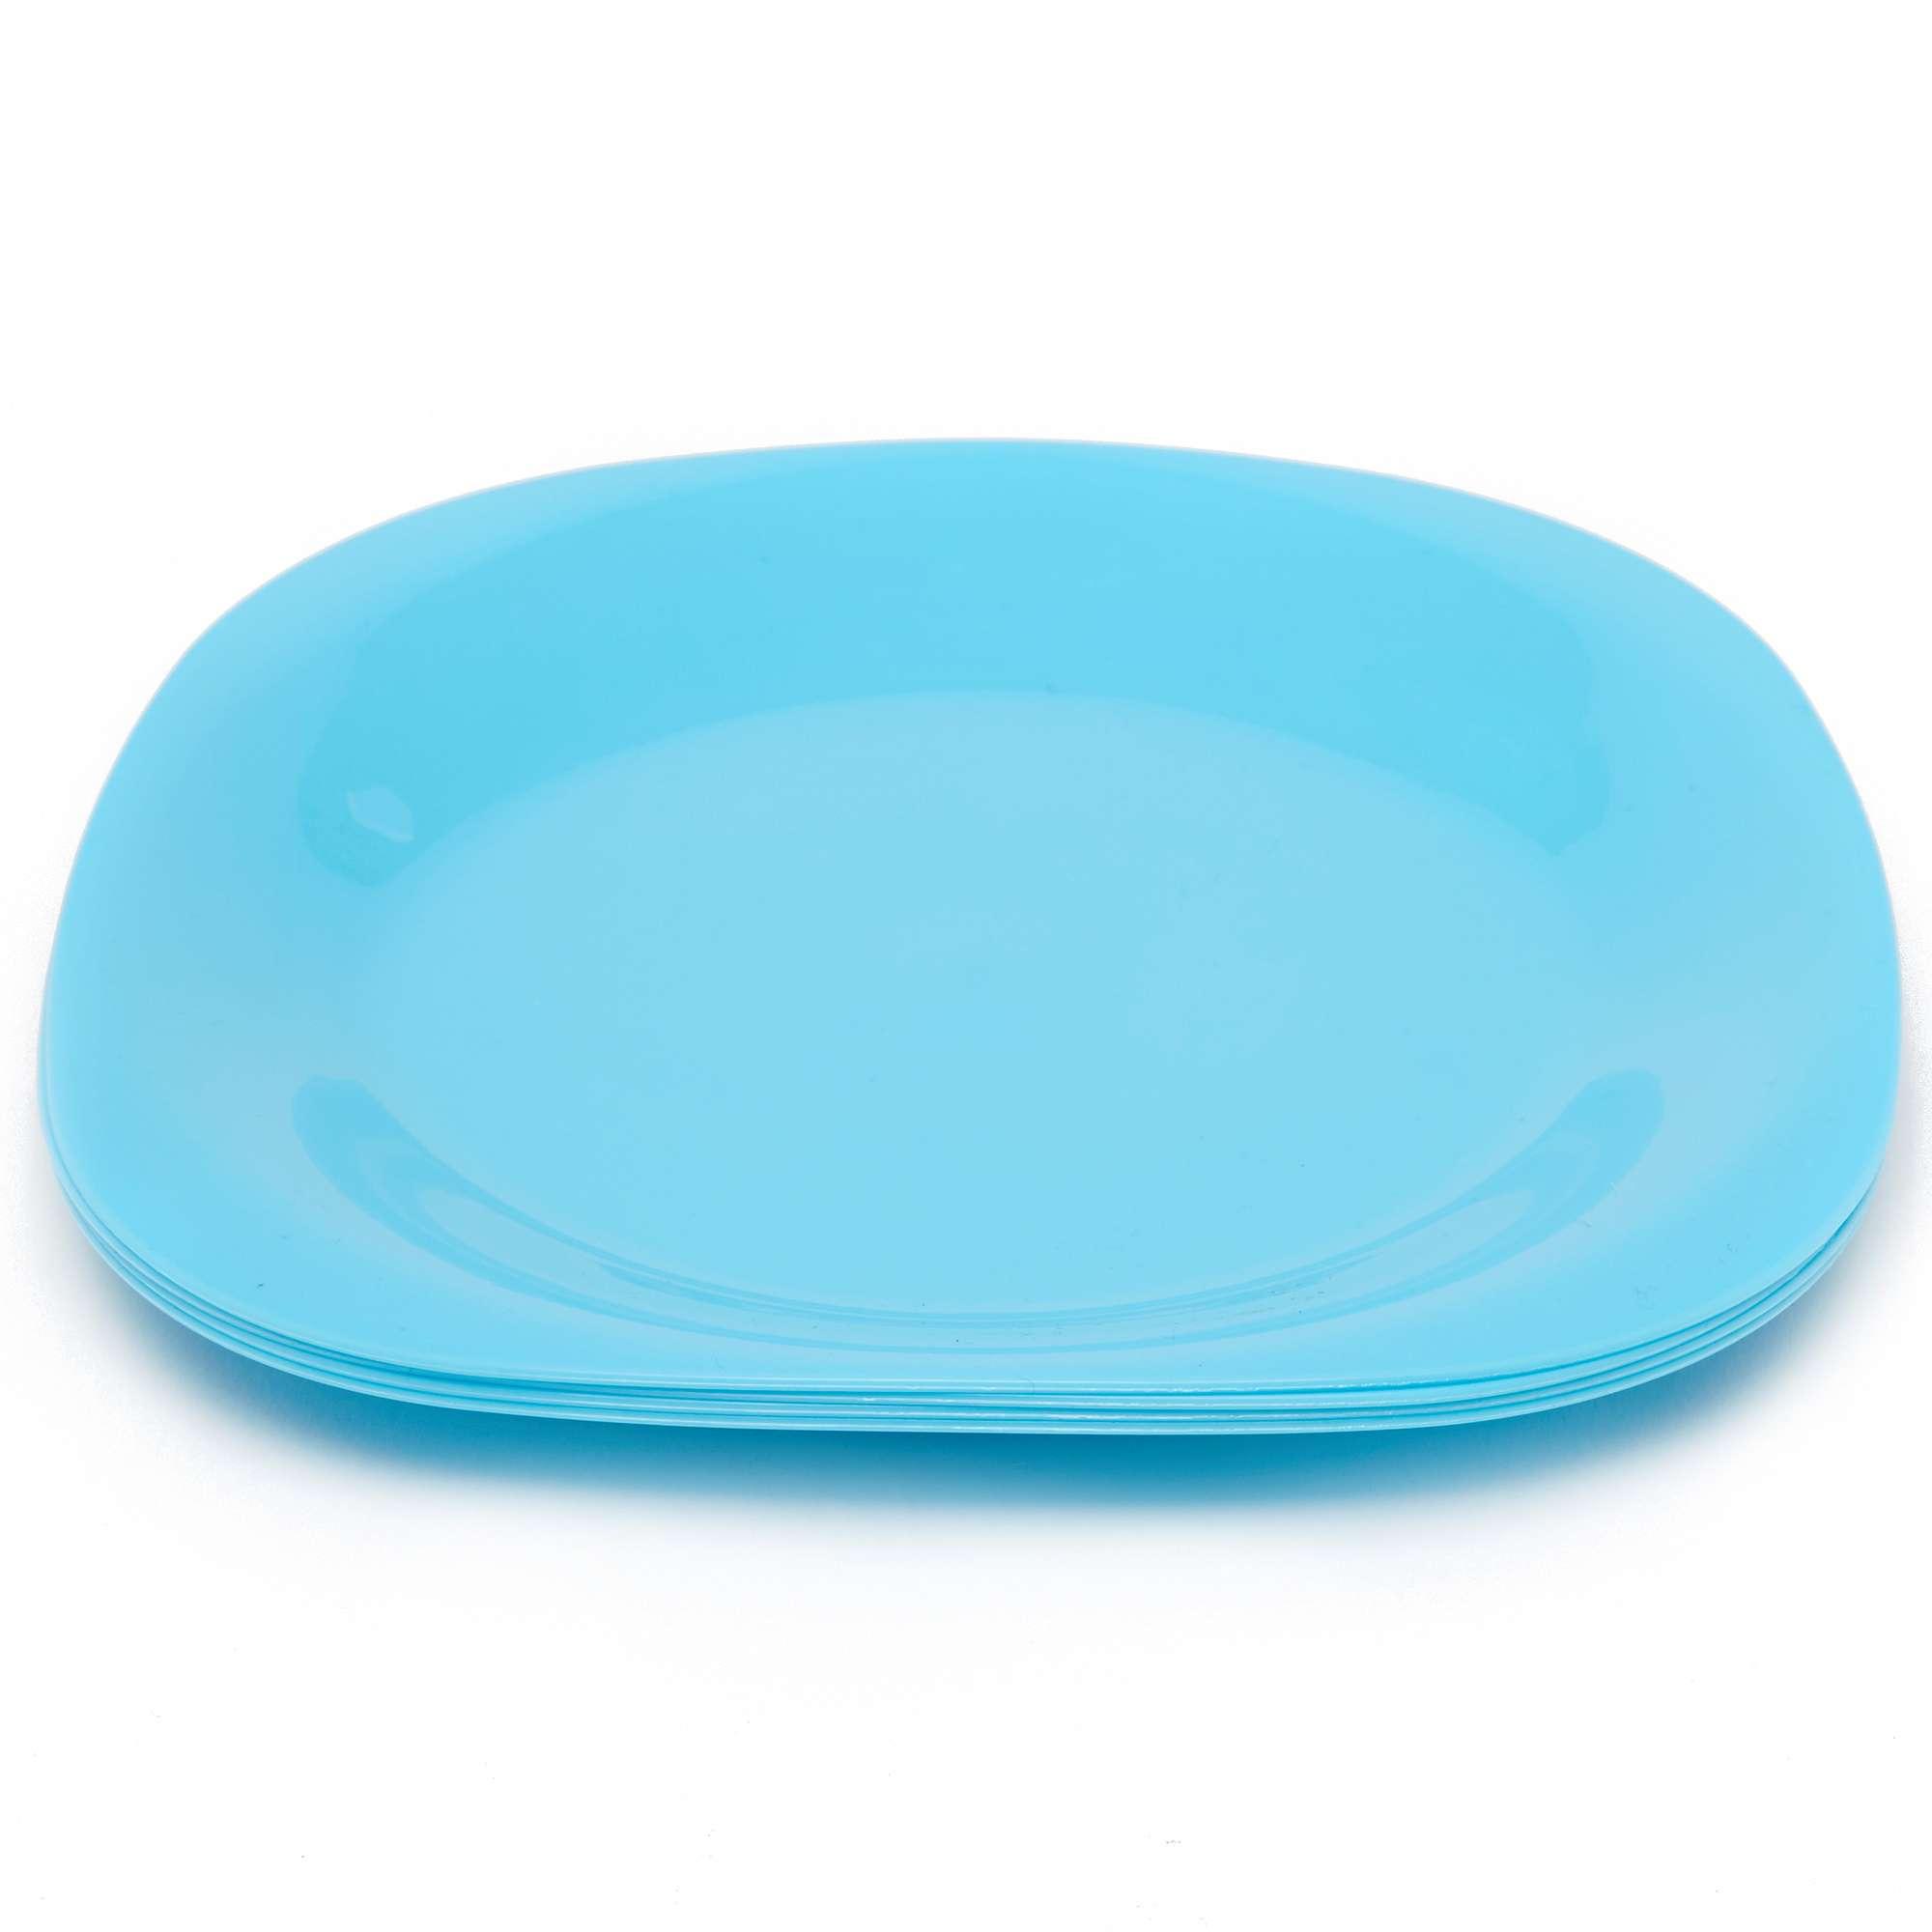 BOYZ TOYS Picnic Plate 4 Pack